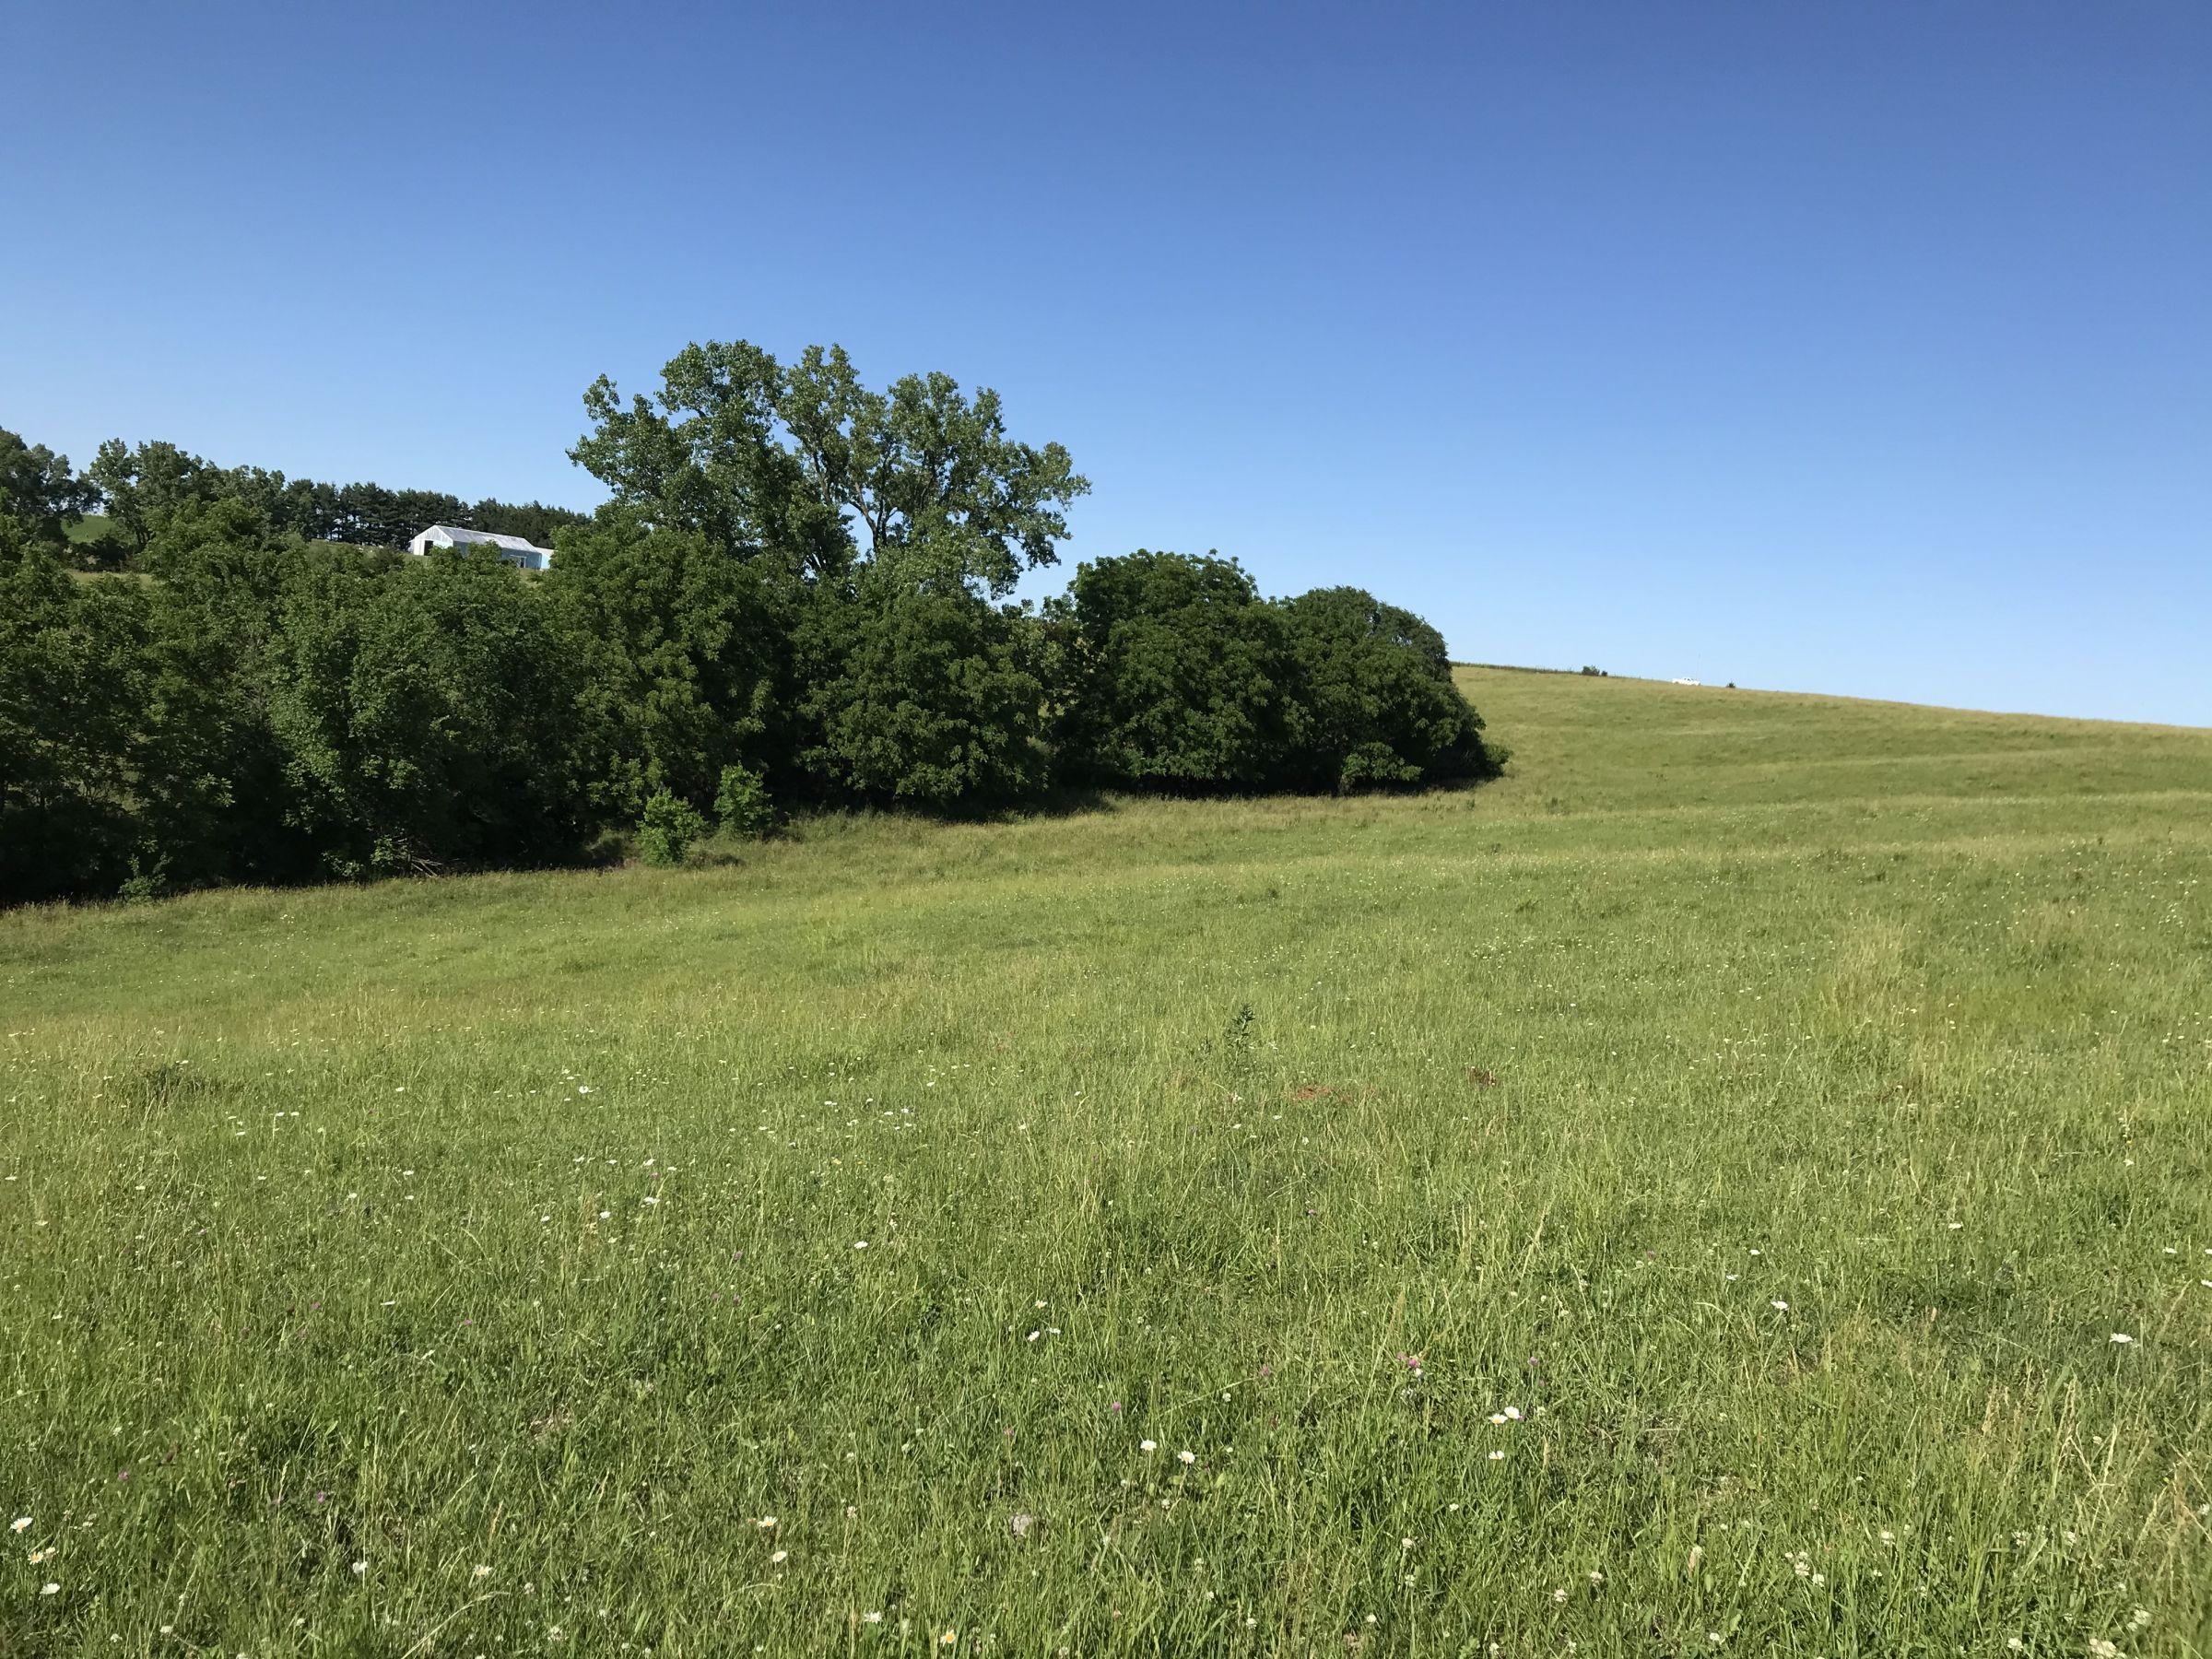 land-warren-county-iowa-60-acres-listing-number-15033-6-2020-06-14-151758.JPG